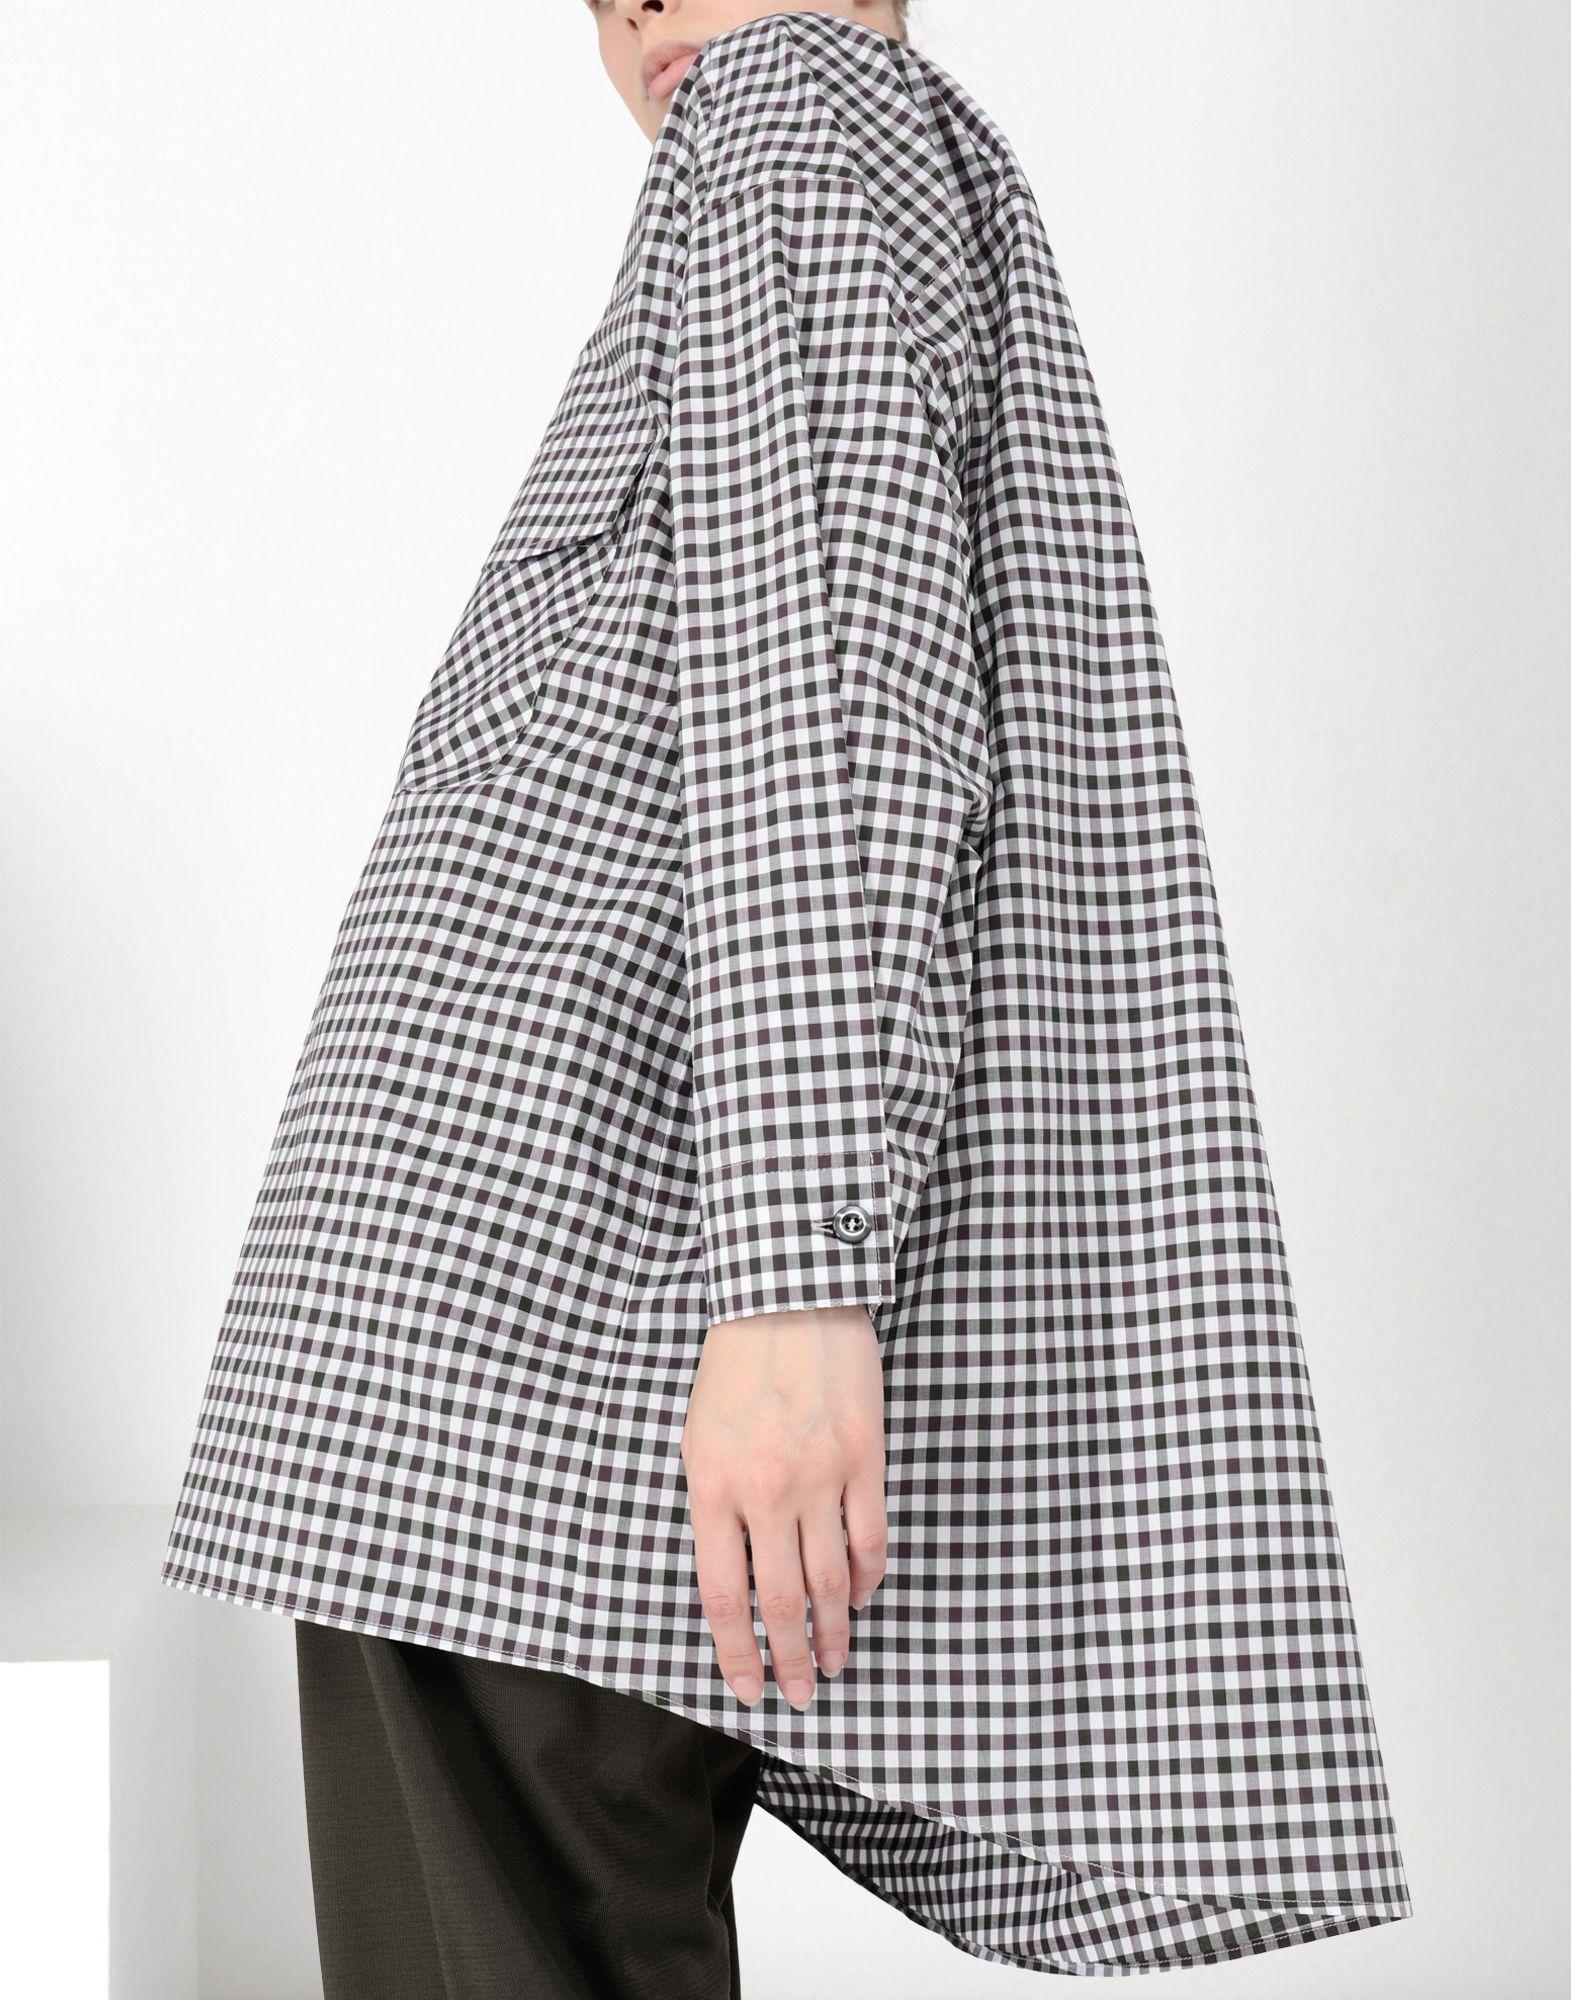 MM6 MAISON MARGIELA Oversized checked shirt 3/4 length dress Woman a